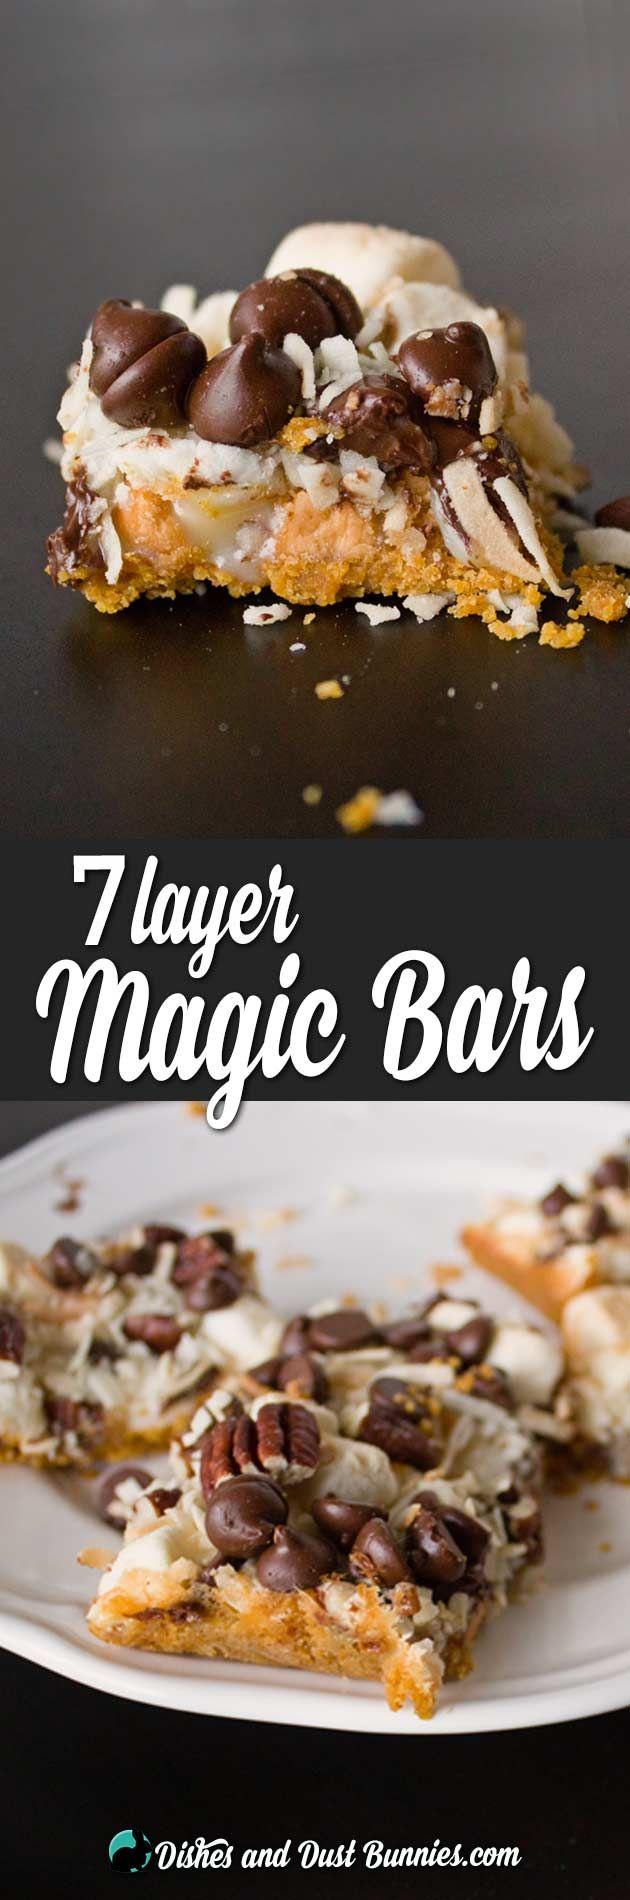 7 Layer Magic Bars from dishesanddustbunnies.com